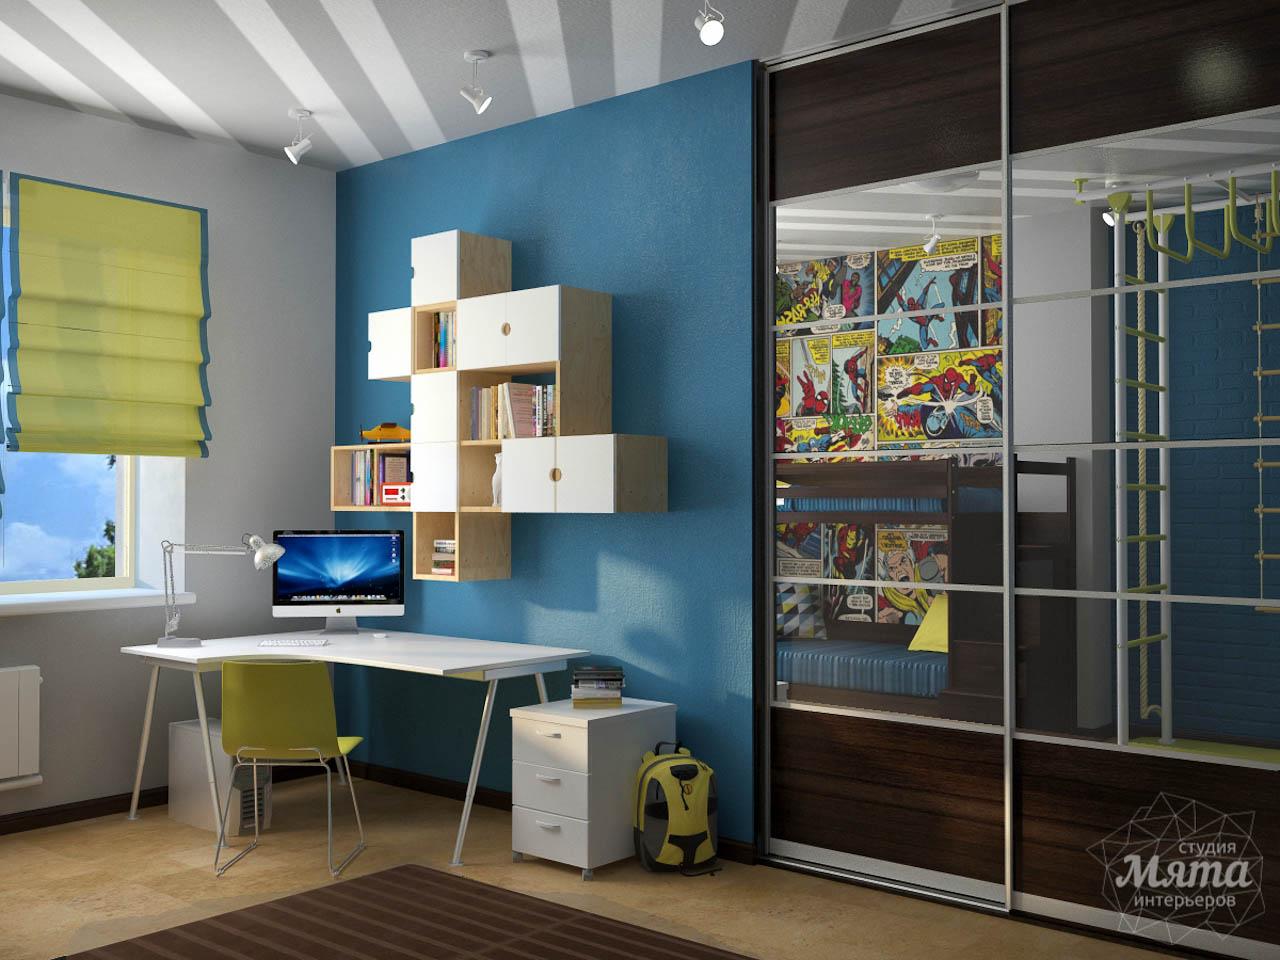 Дизайн проект интерьера коттеджа  в стиле минимализм по ул. Барвинка 15 img733519402